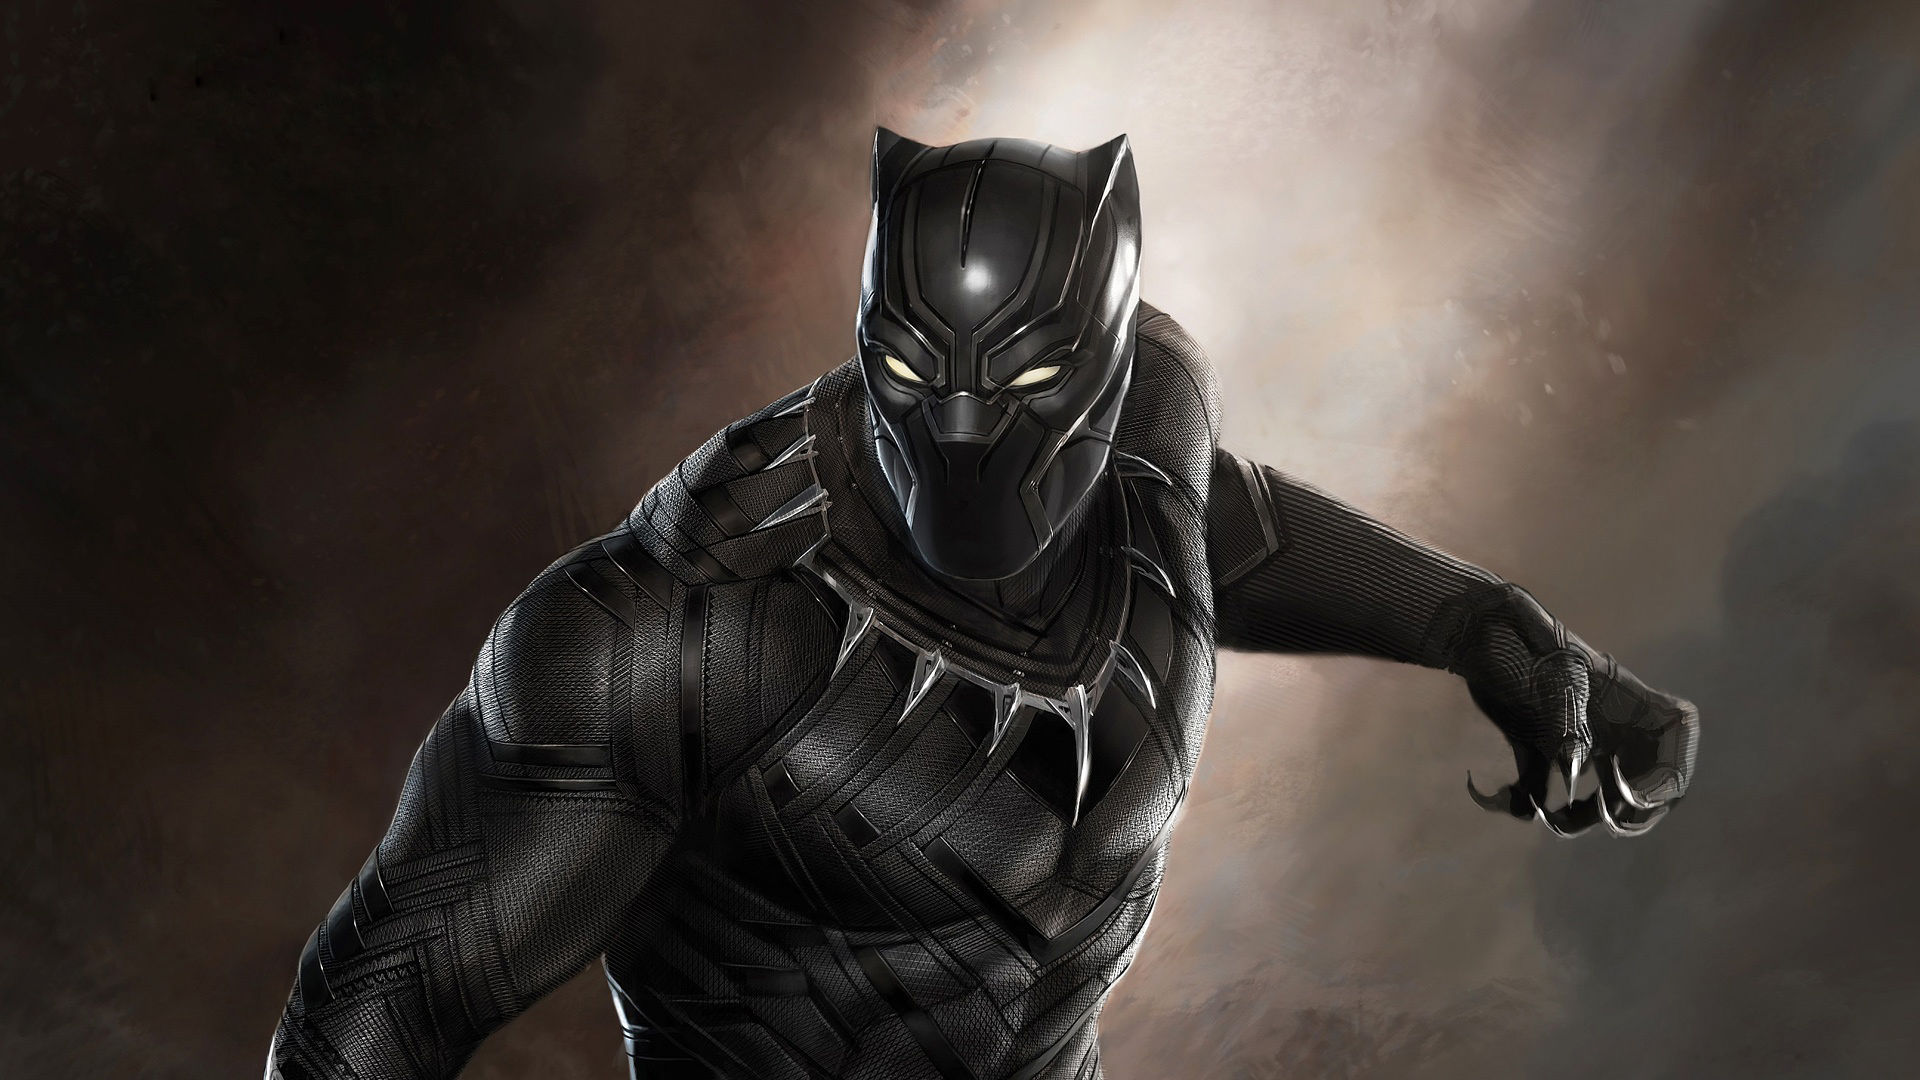 Captain America- Civil War - Cap vs Black Panther TV spot